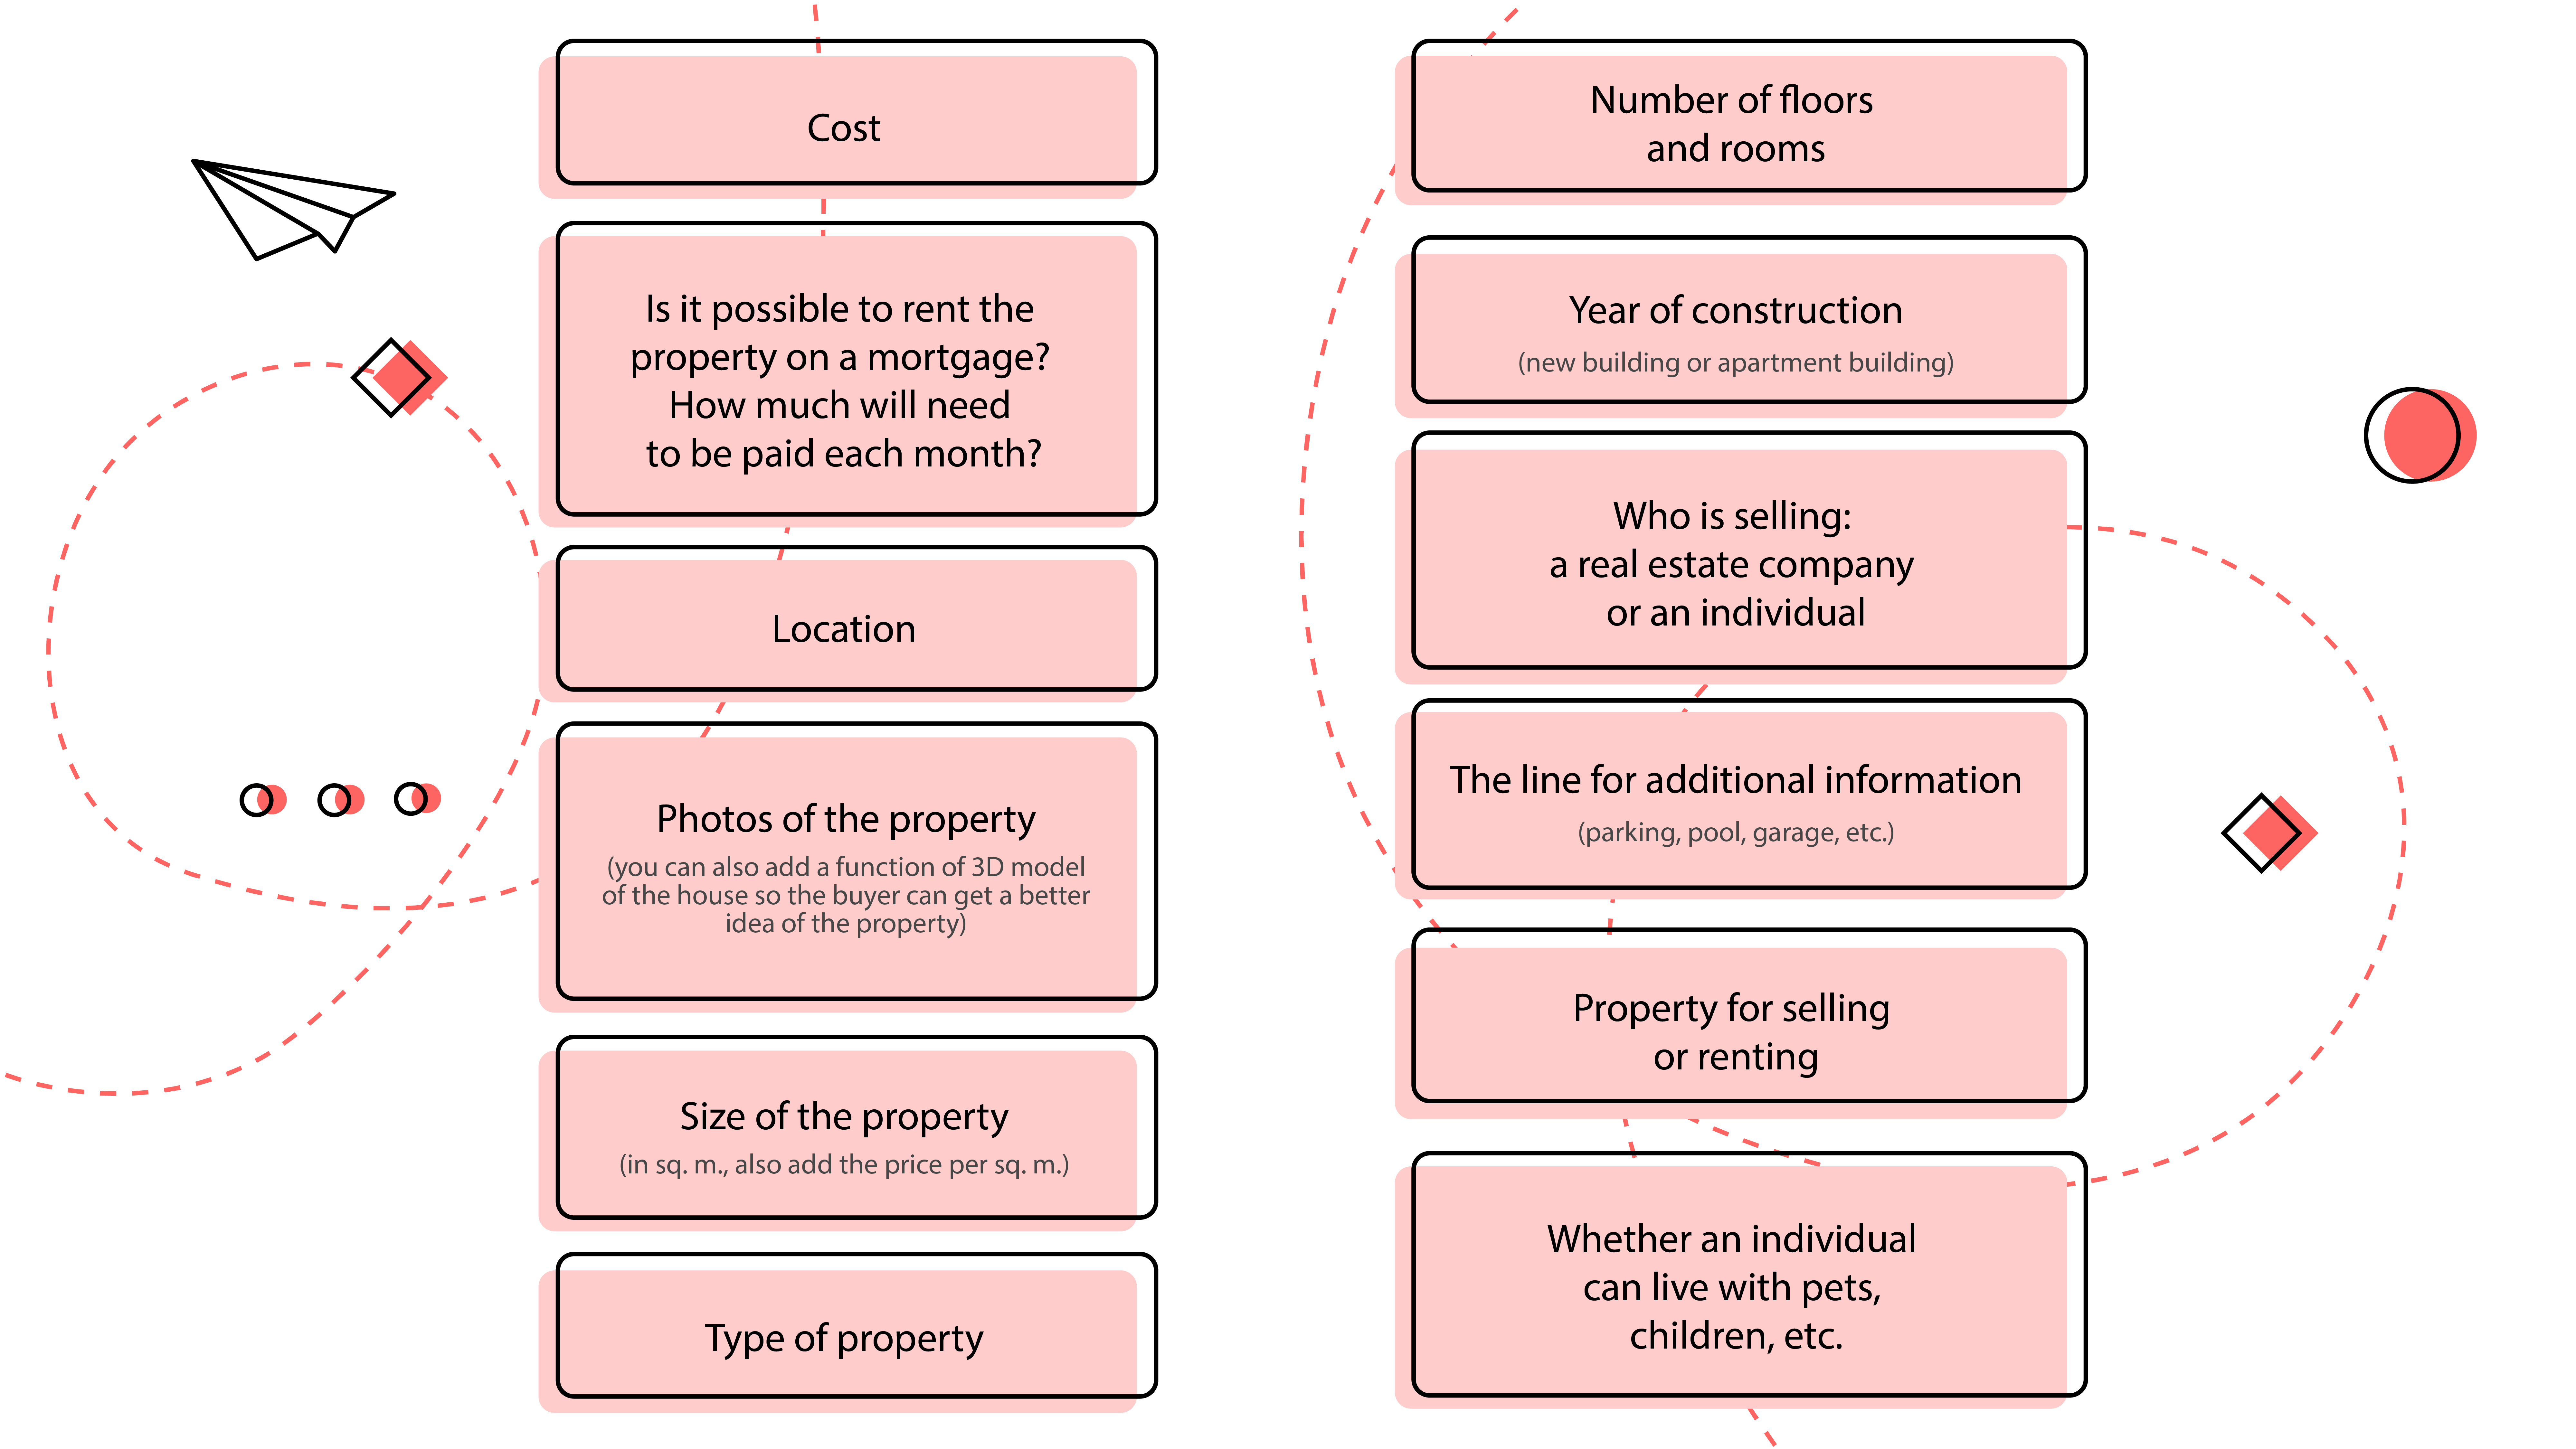 example of real estate's description